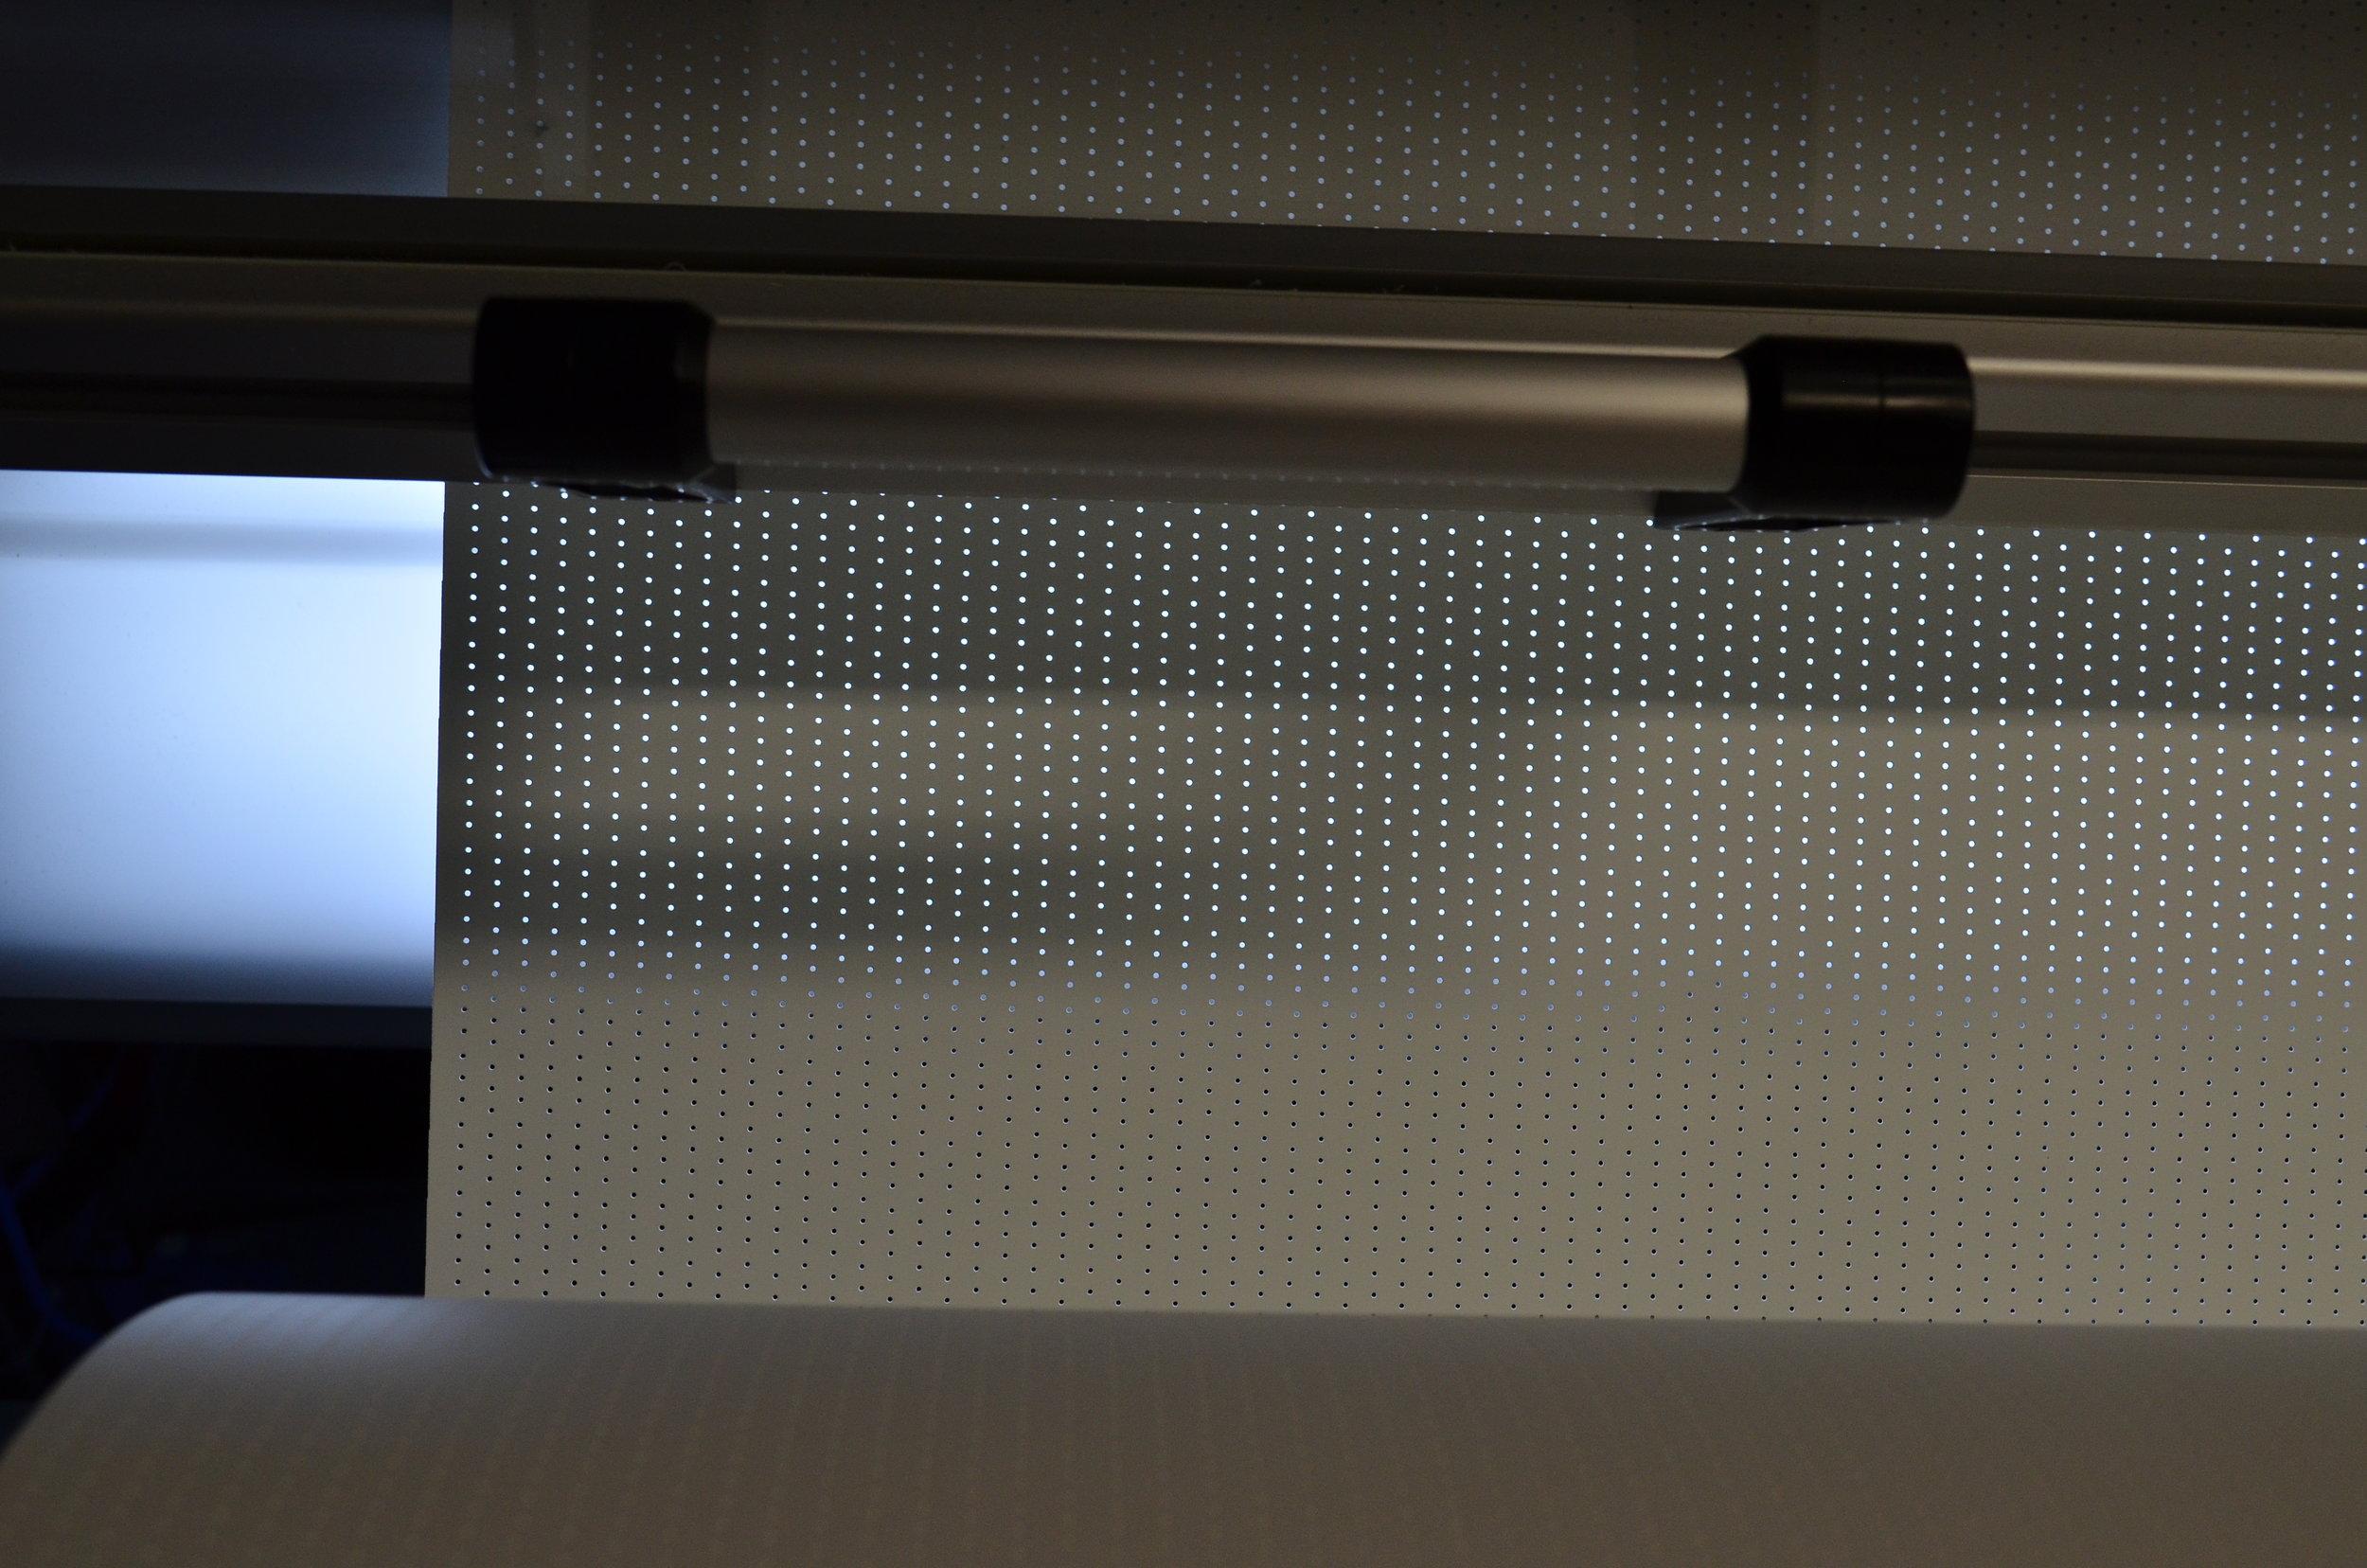 Harkness' 4K Digital Perforation Pattern.